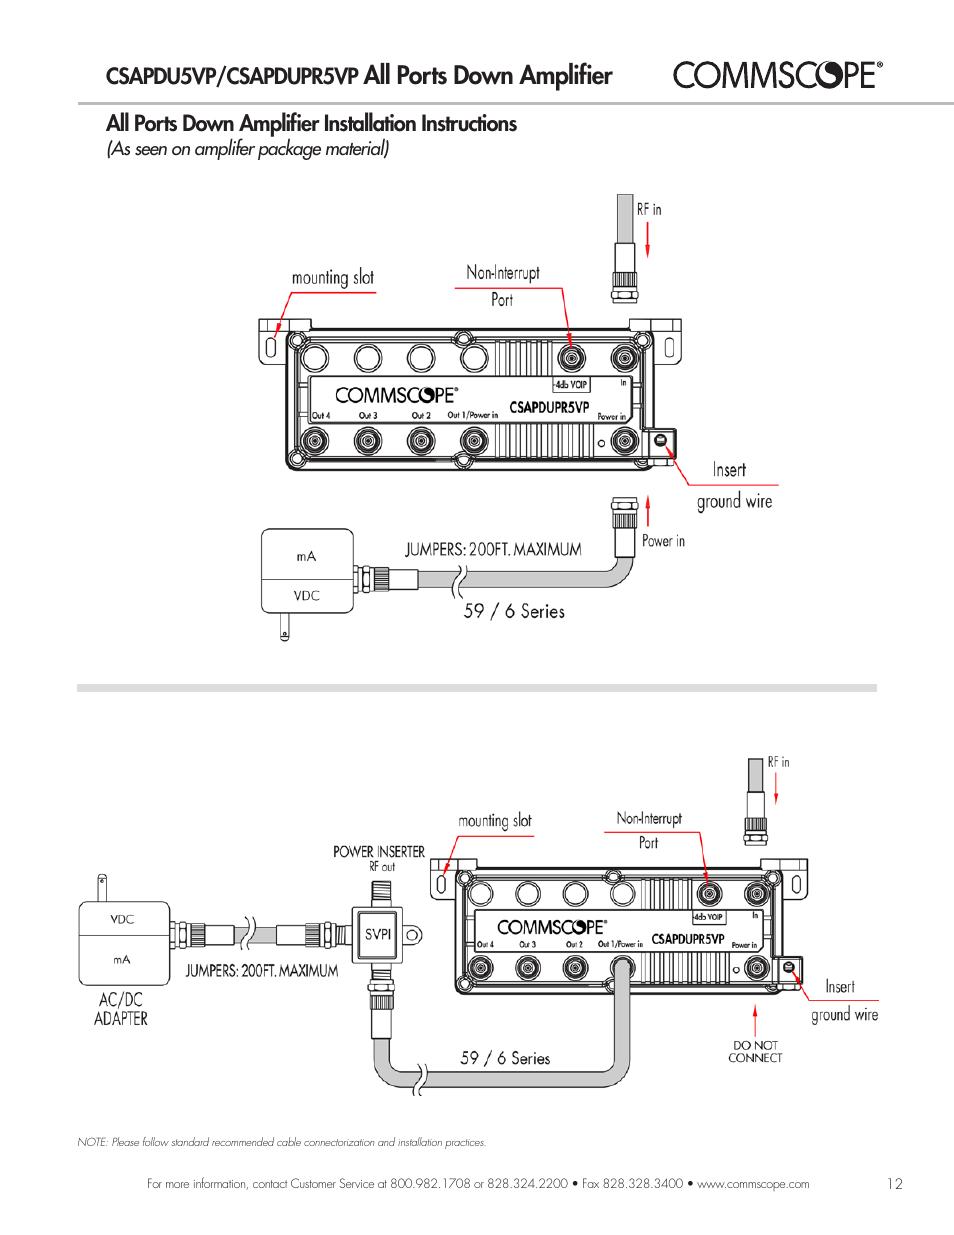 All Ports Down Amplifier, Csapdu5vp/csapdupr5vp, All Ports